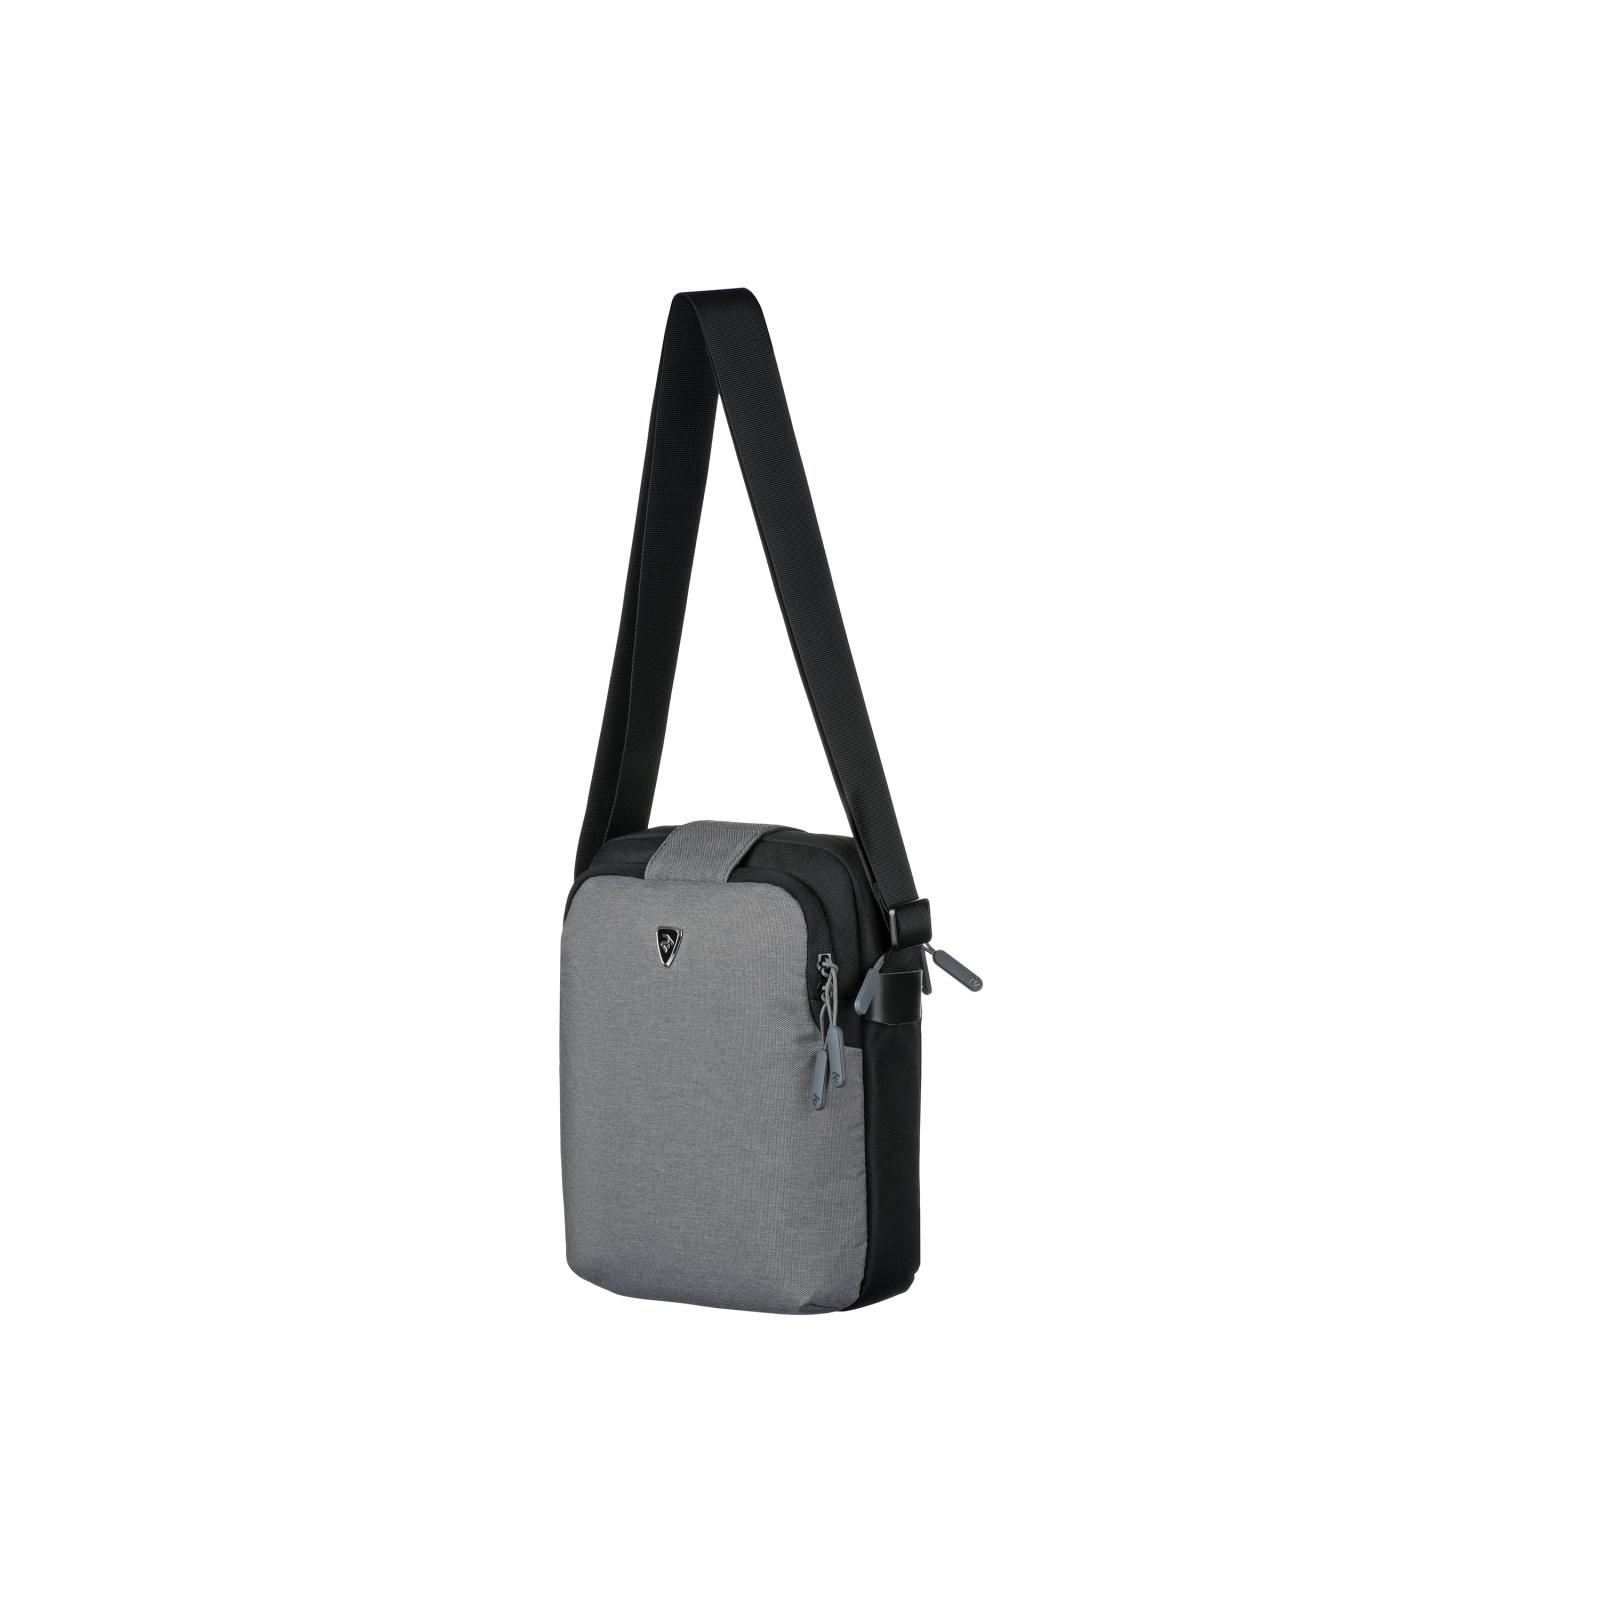 "Сумка для ноутбука 2E 10"" Supreme, Grey (2E-TBT9180BK) зображення 12"